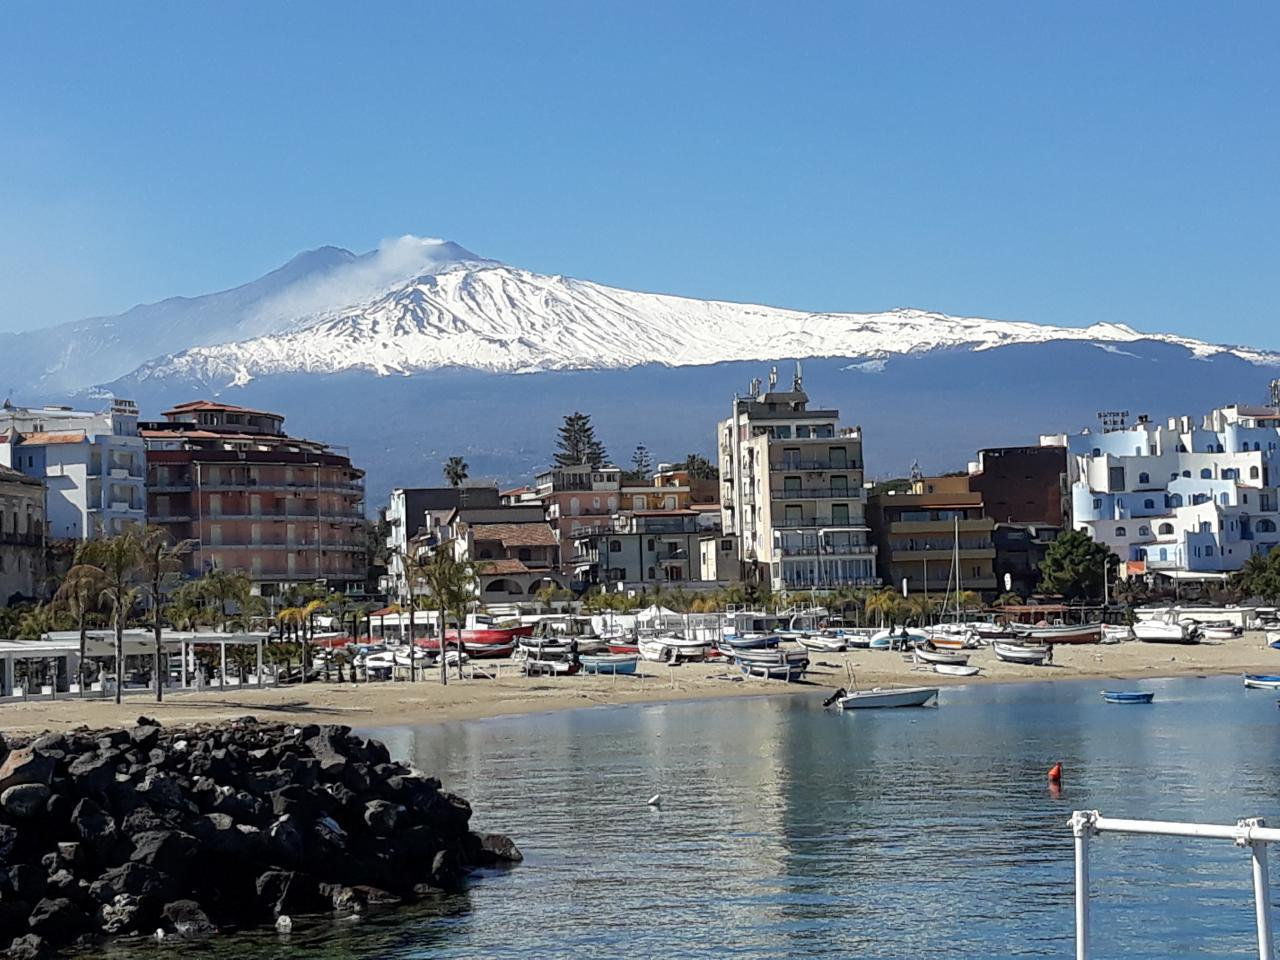 Appartement de vacances MARE - ETNA - TAORMINA (2618228), Mascali, Catania, Sicile, Italie, image 32